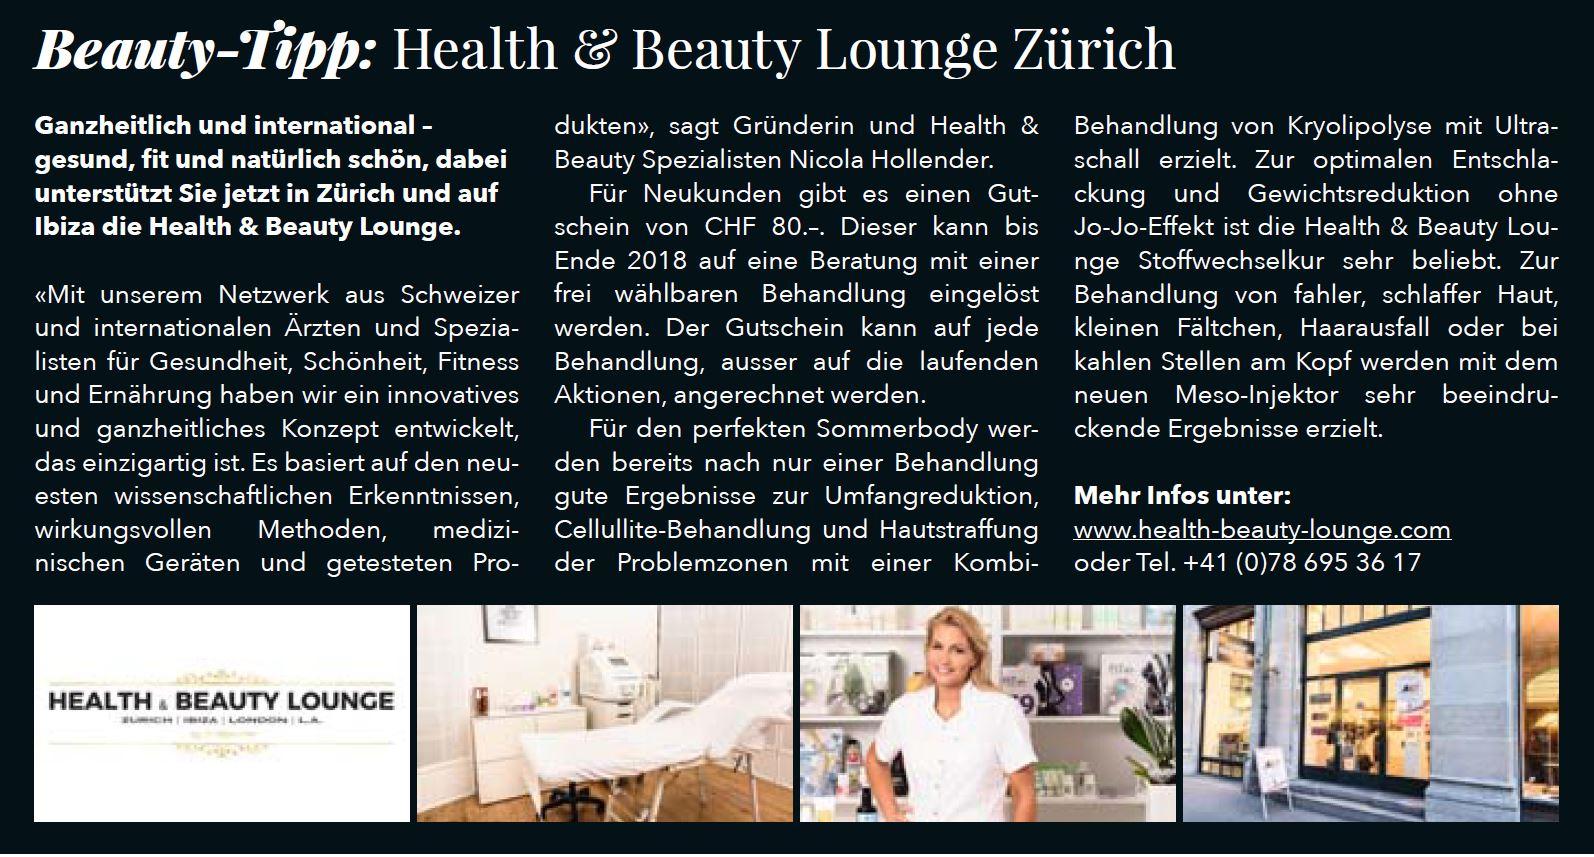 Health & Beauty Lounge Zurich